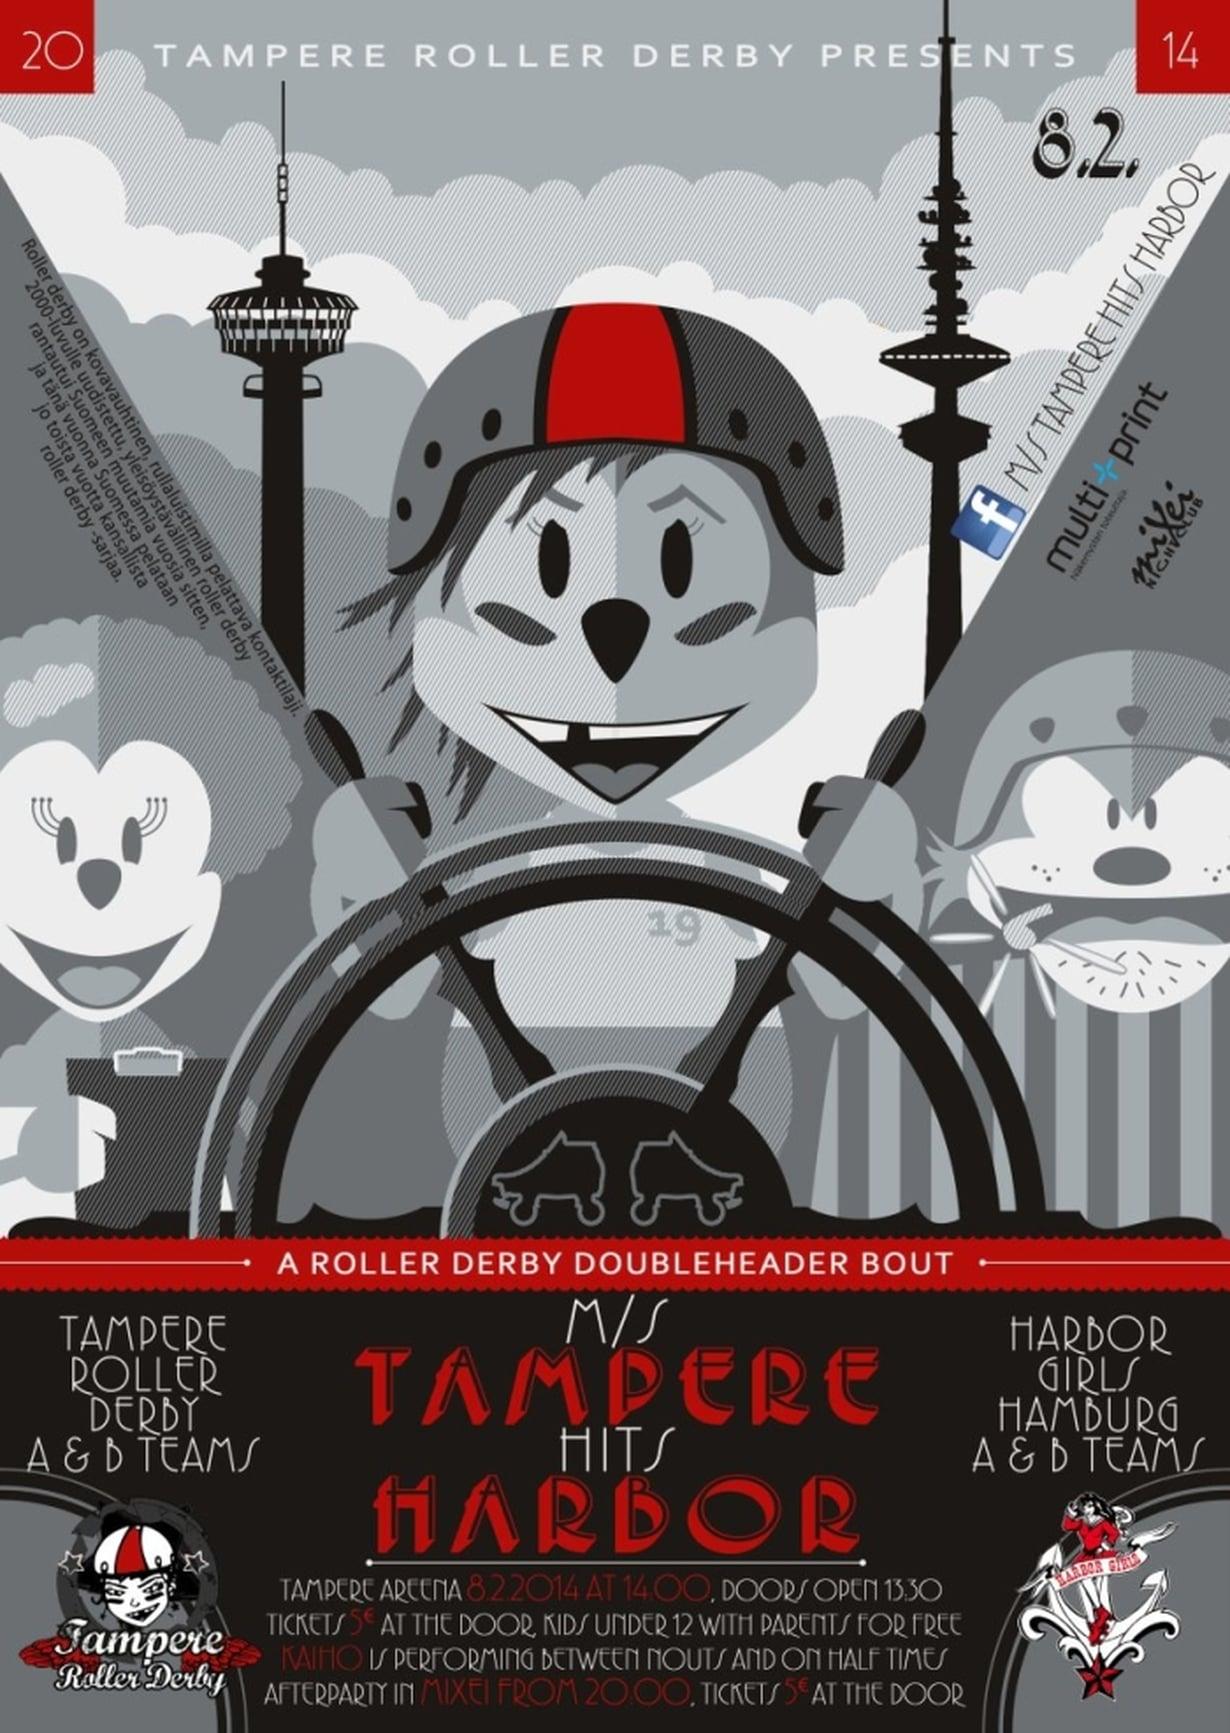 TampereRollerDerbyHarbor-juliste